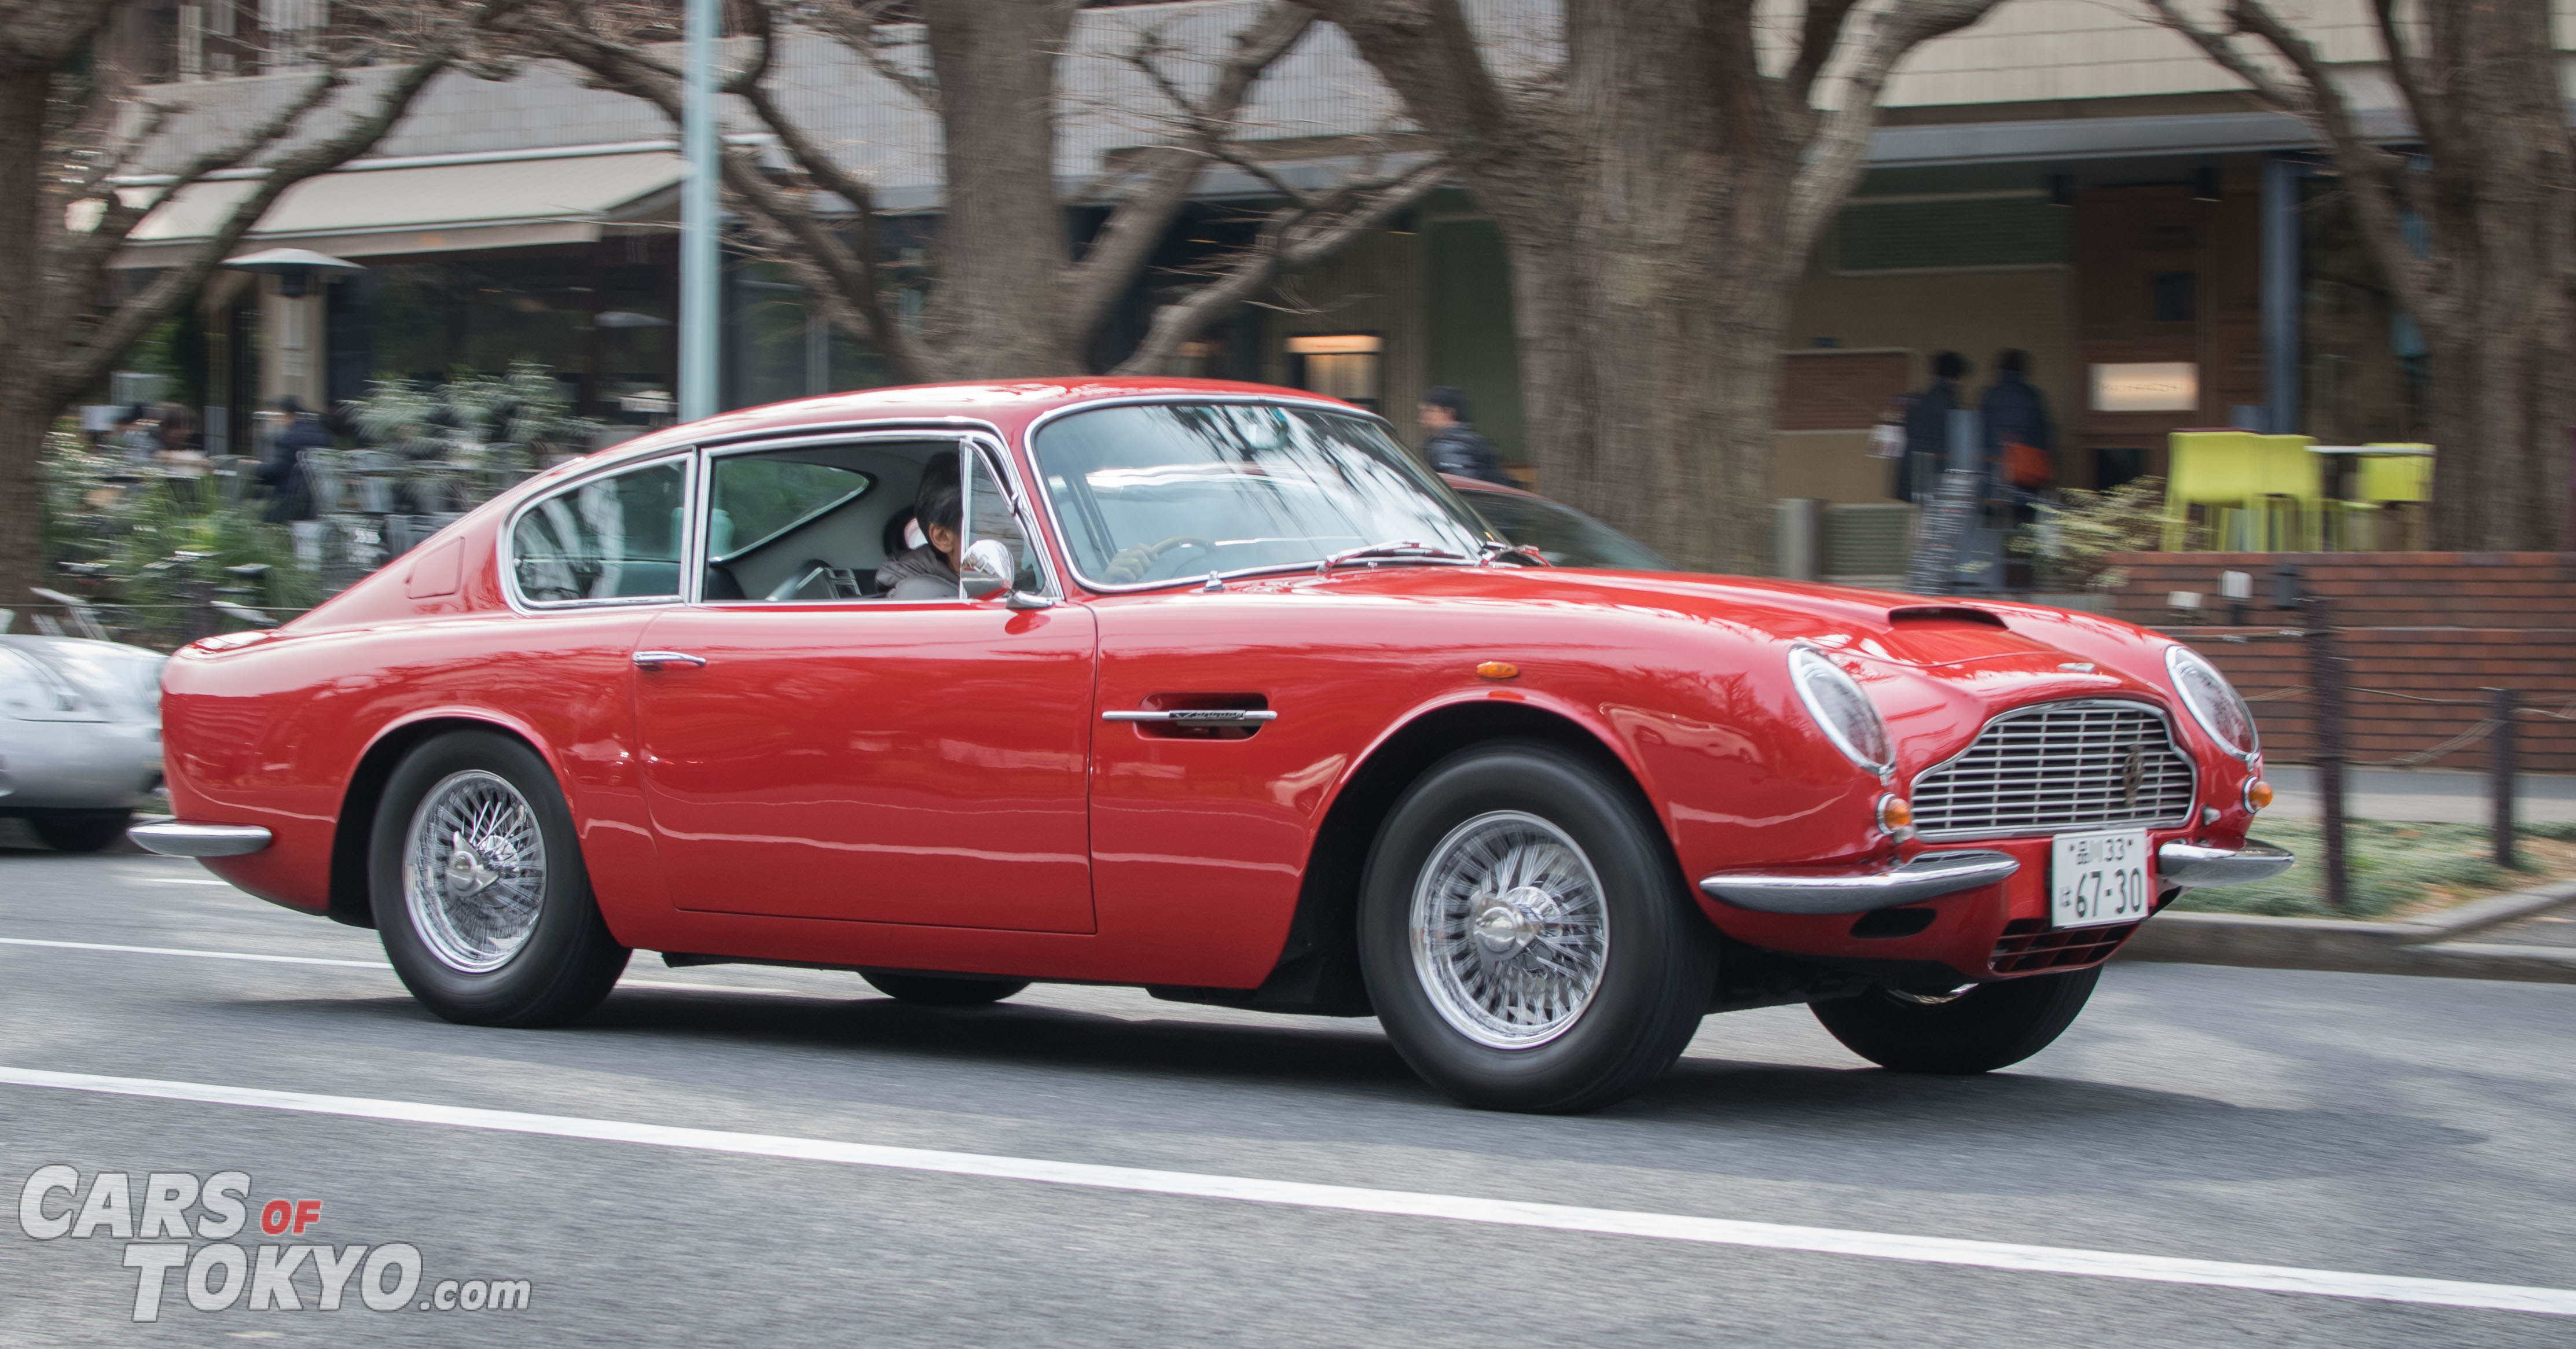 Cars of Tokyo Classic Aston Martin DB6